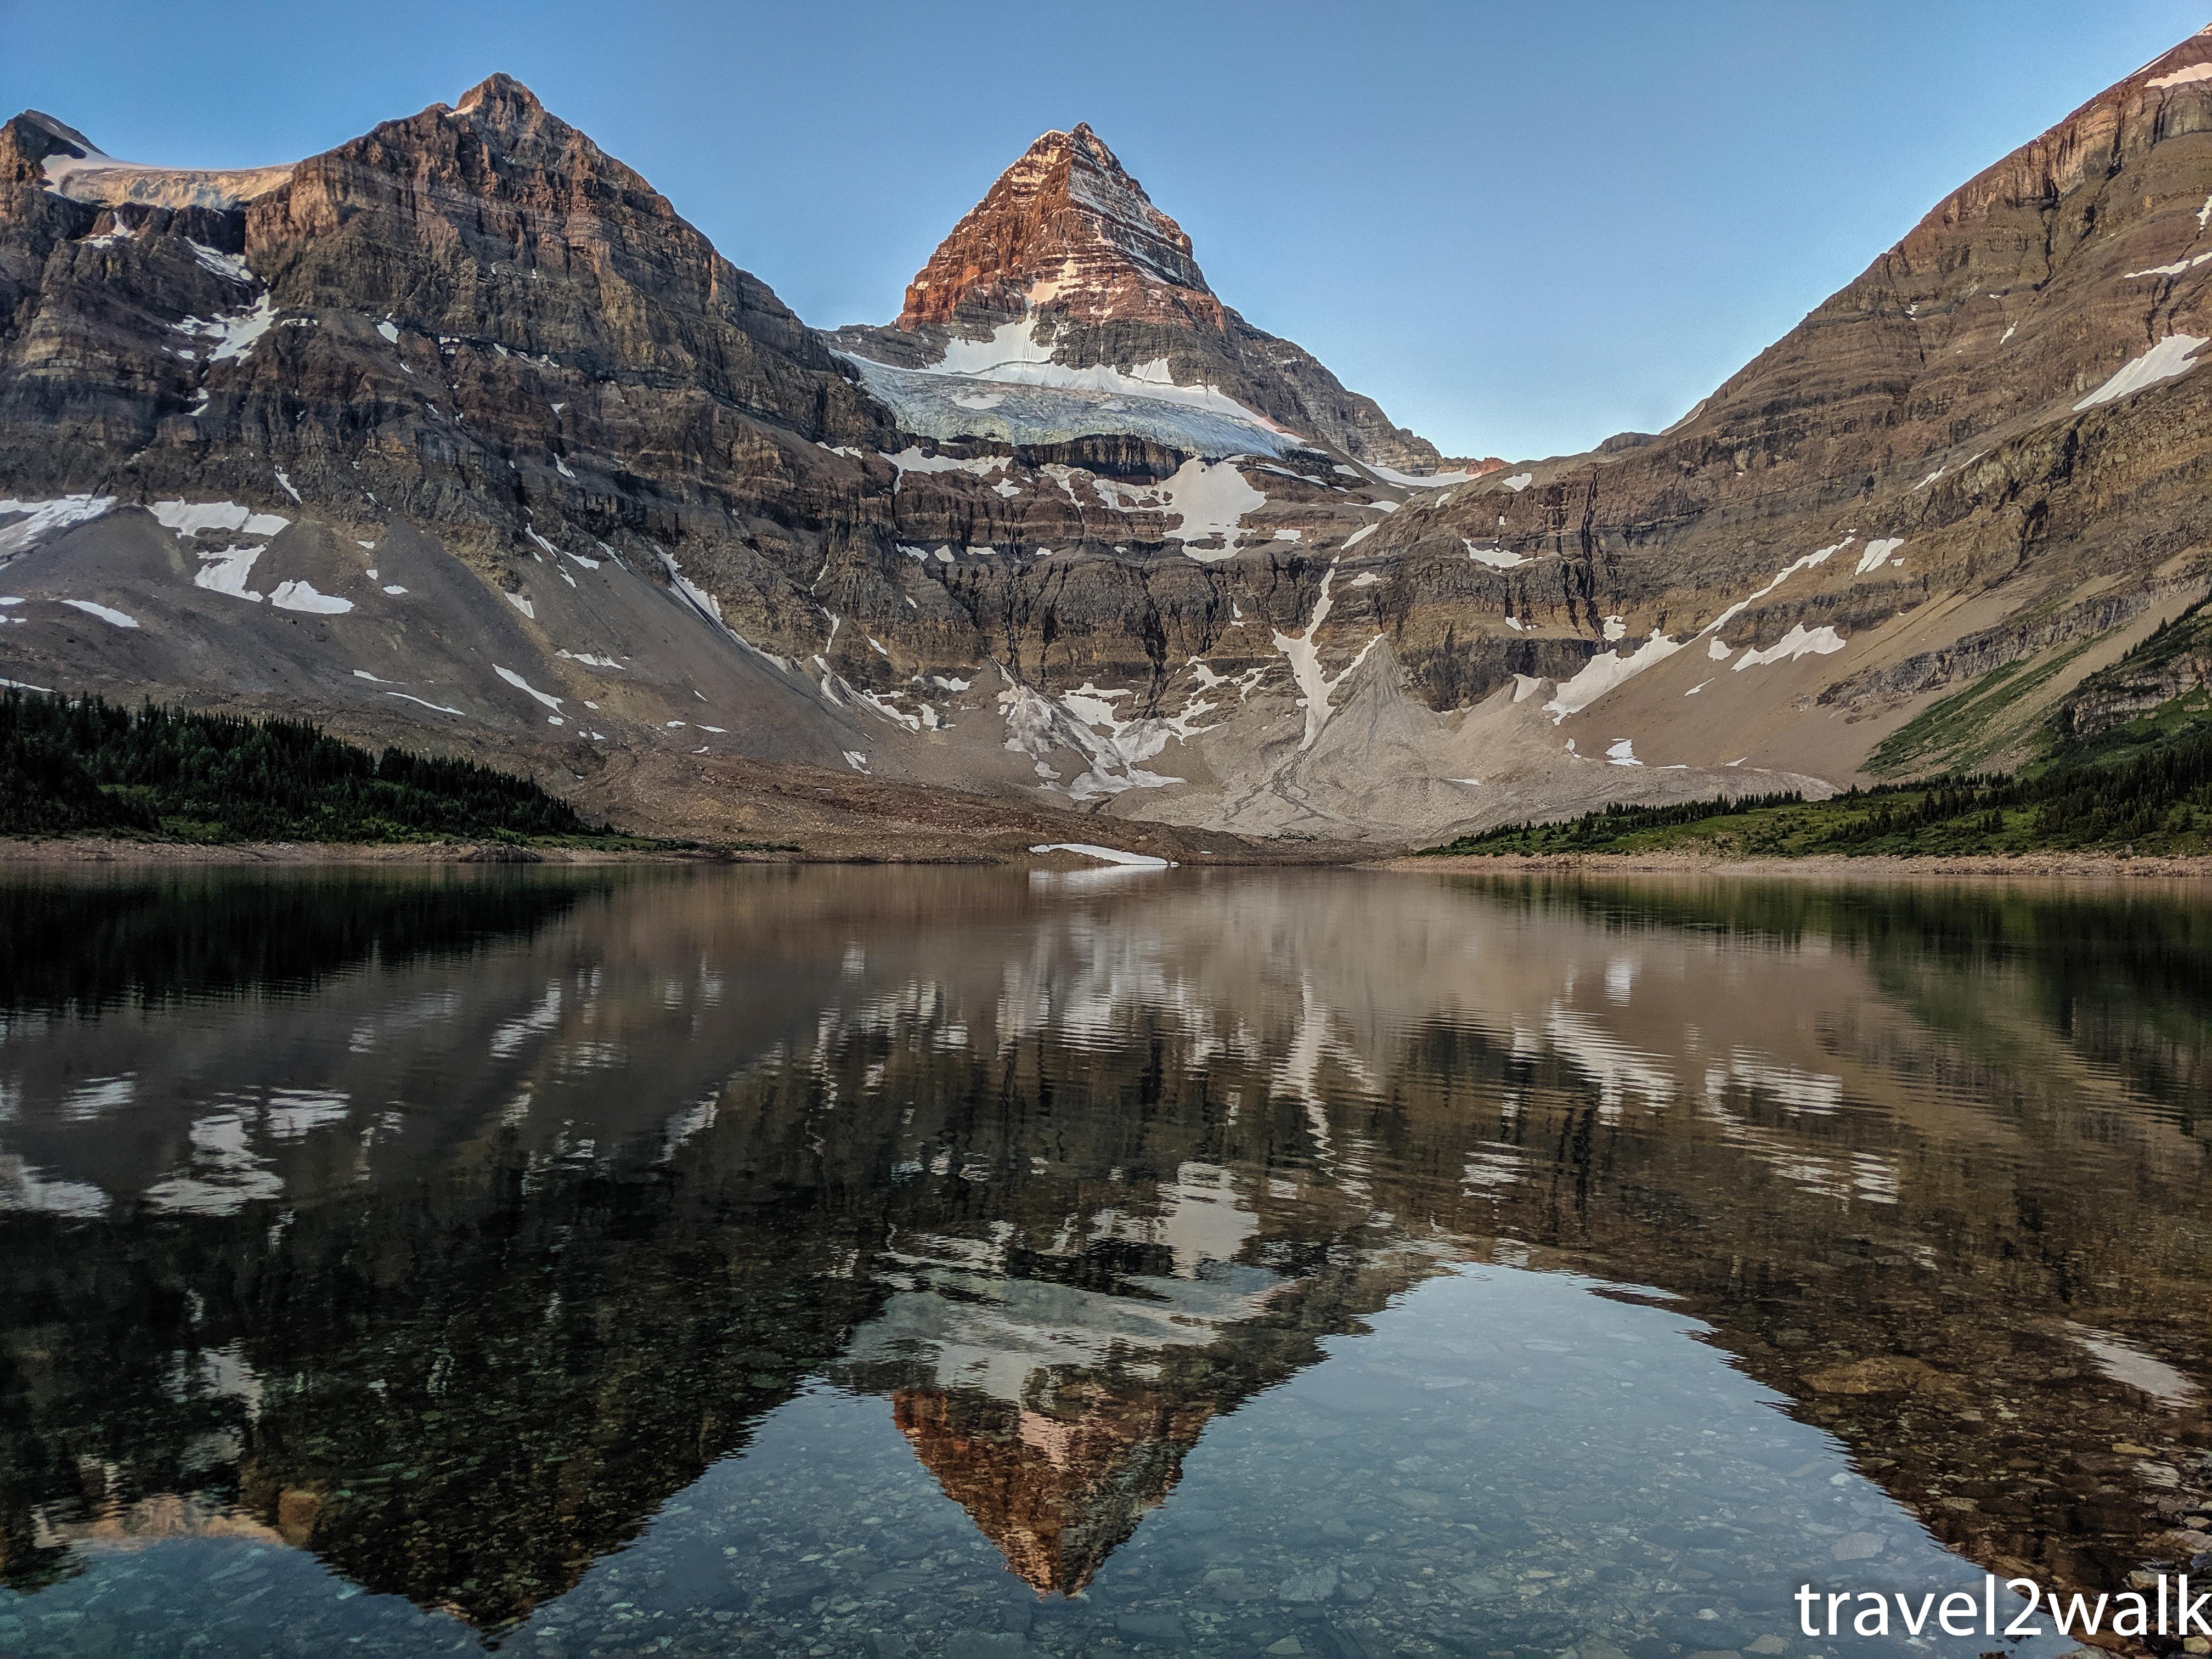 trip report: Mount Assiniboine, August 2019 – travel 2 walk